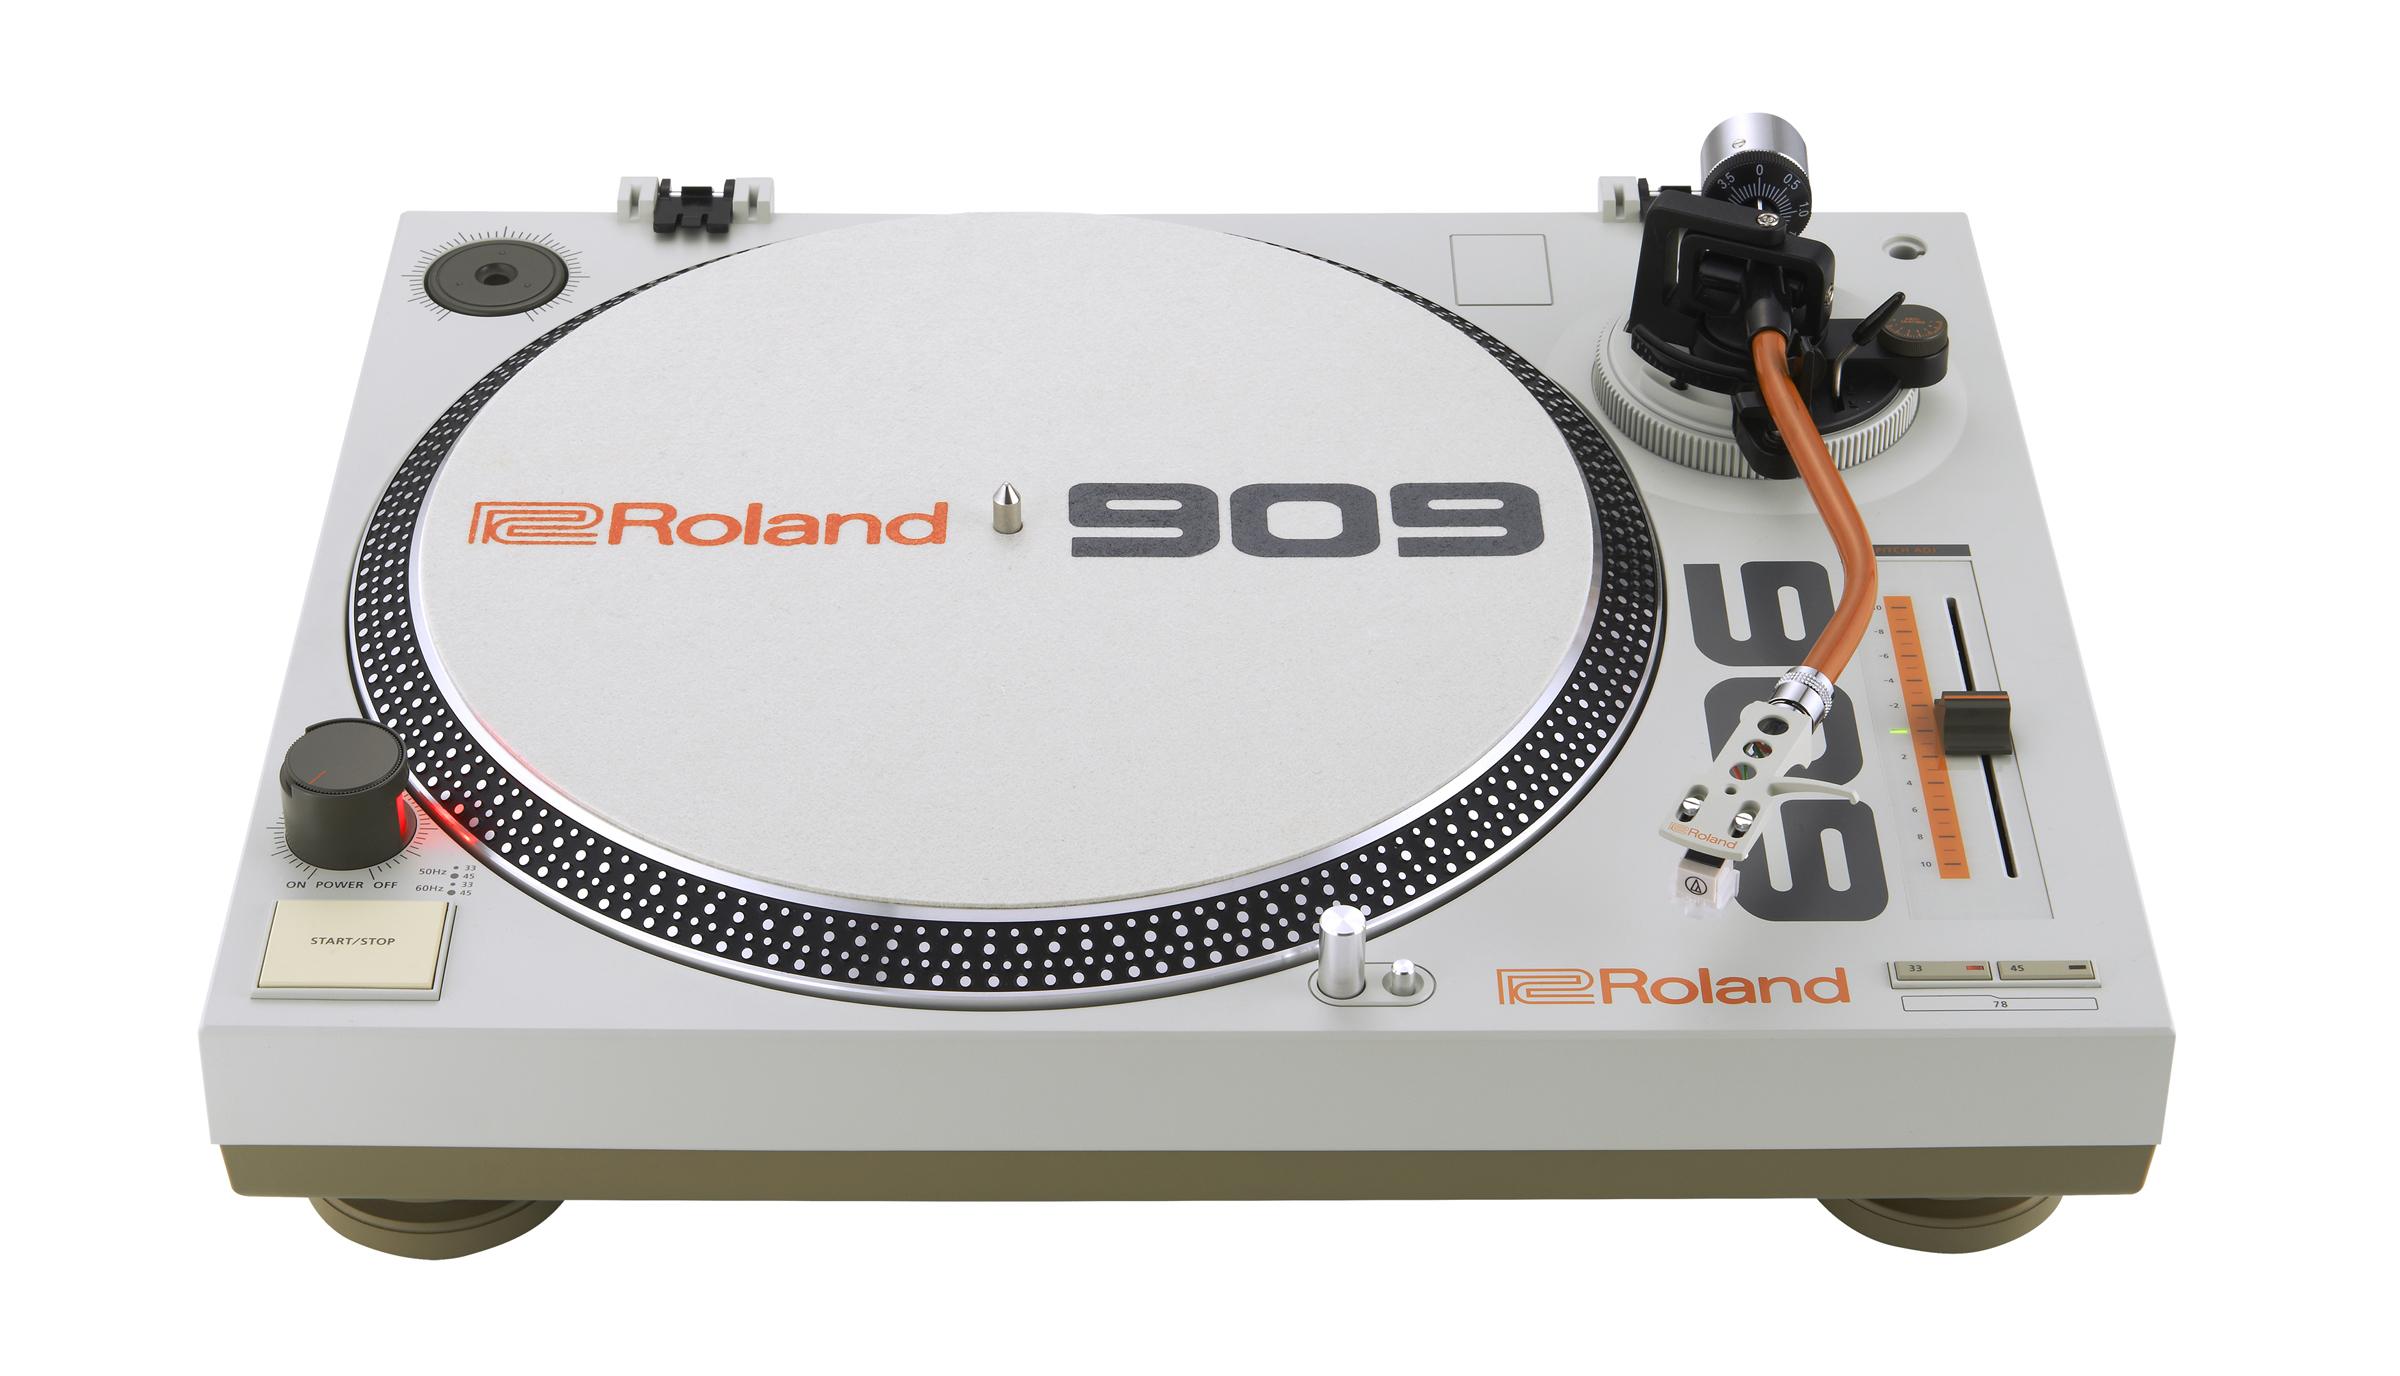 The Roland TT-99